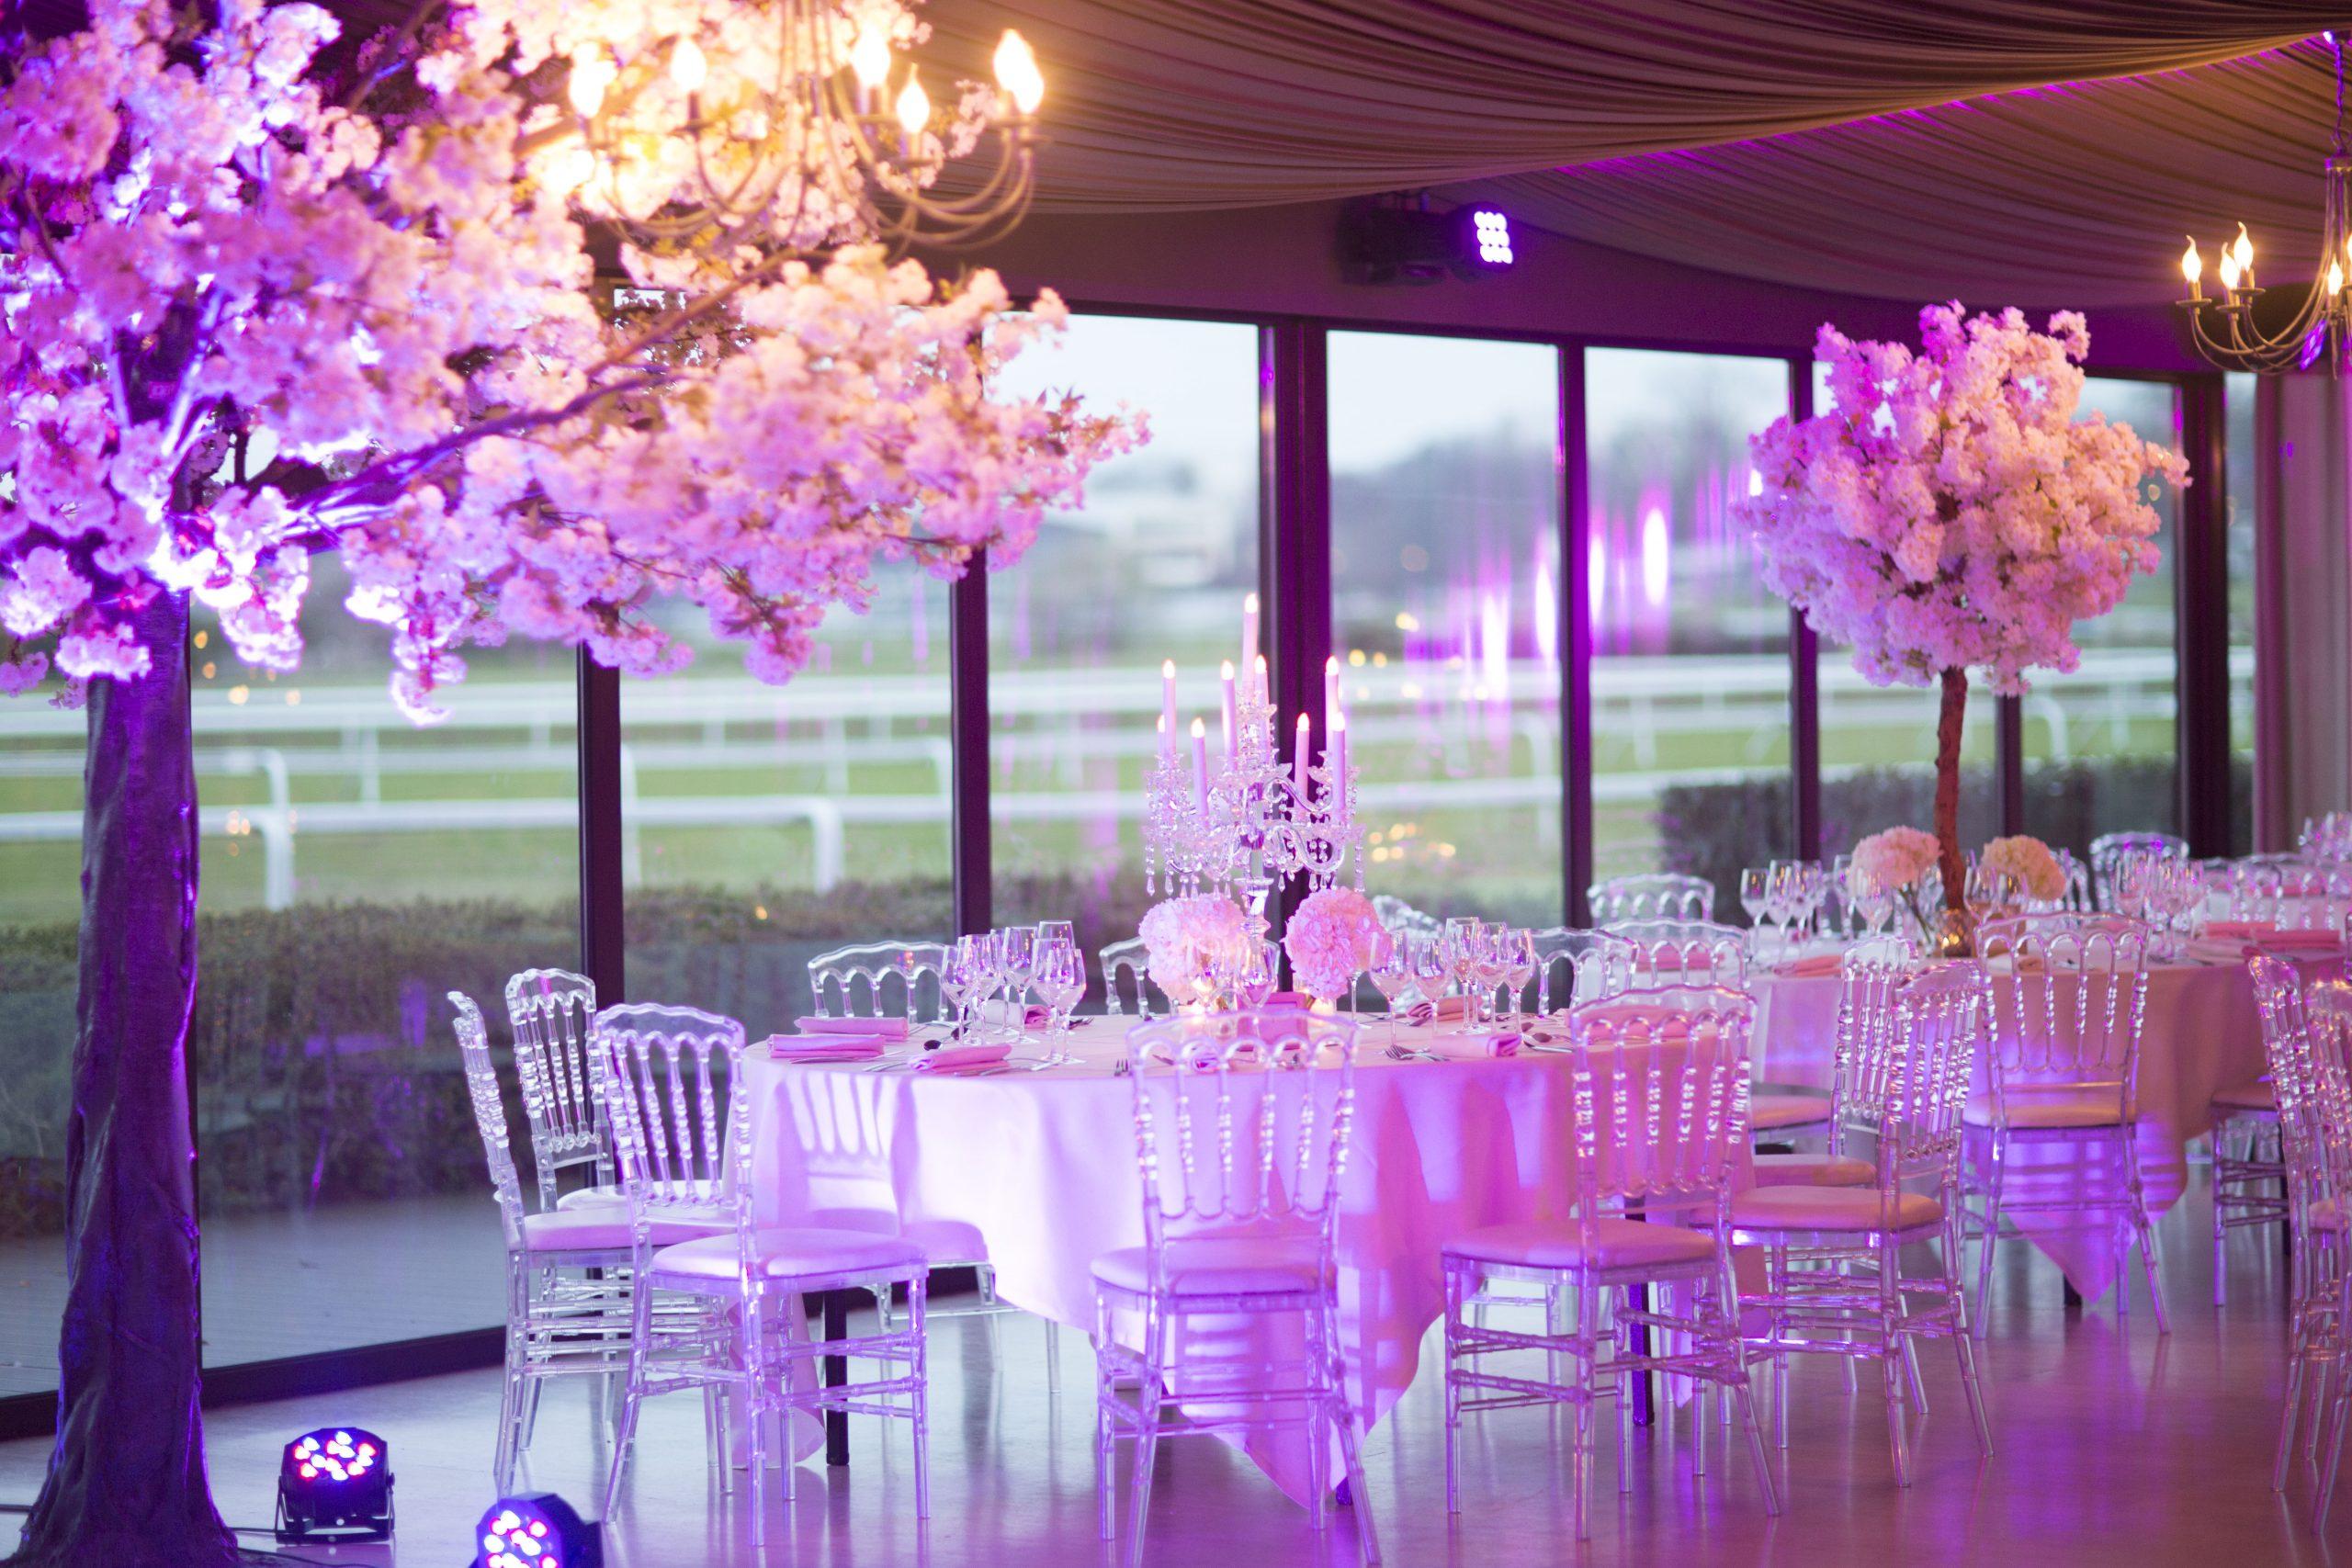 photographe-mariage-decoration-manoir-92